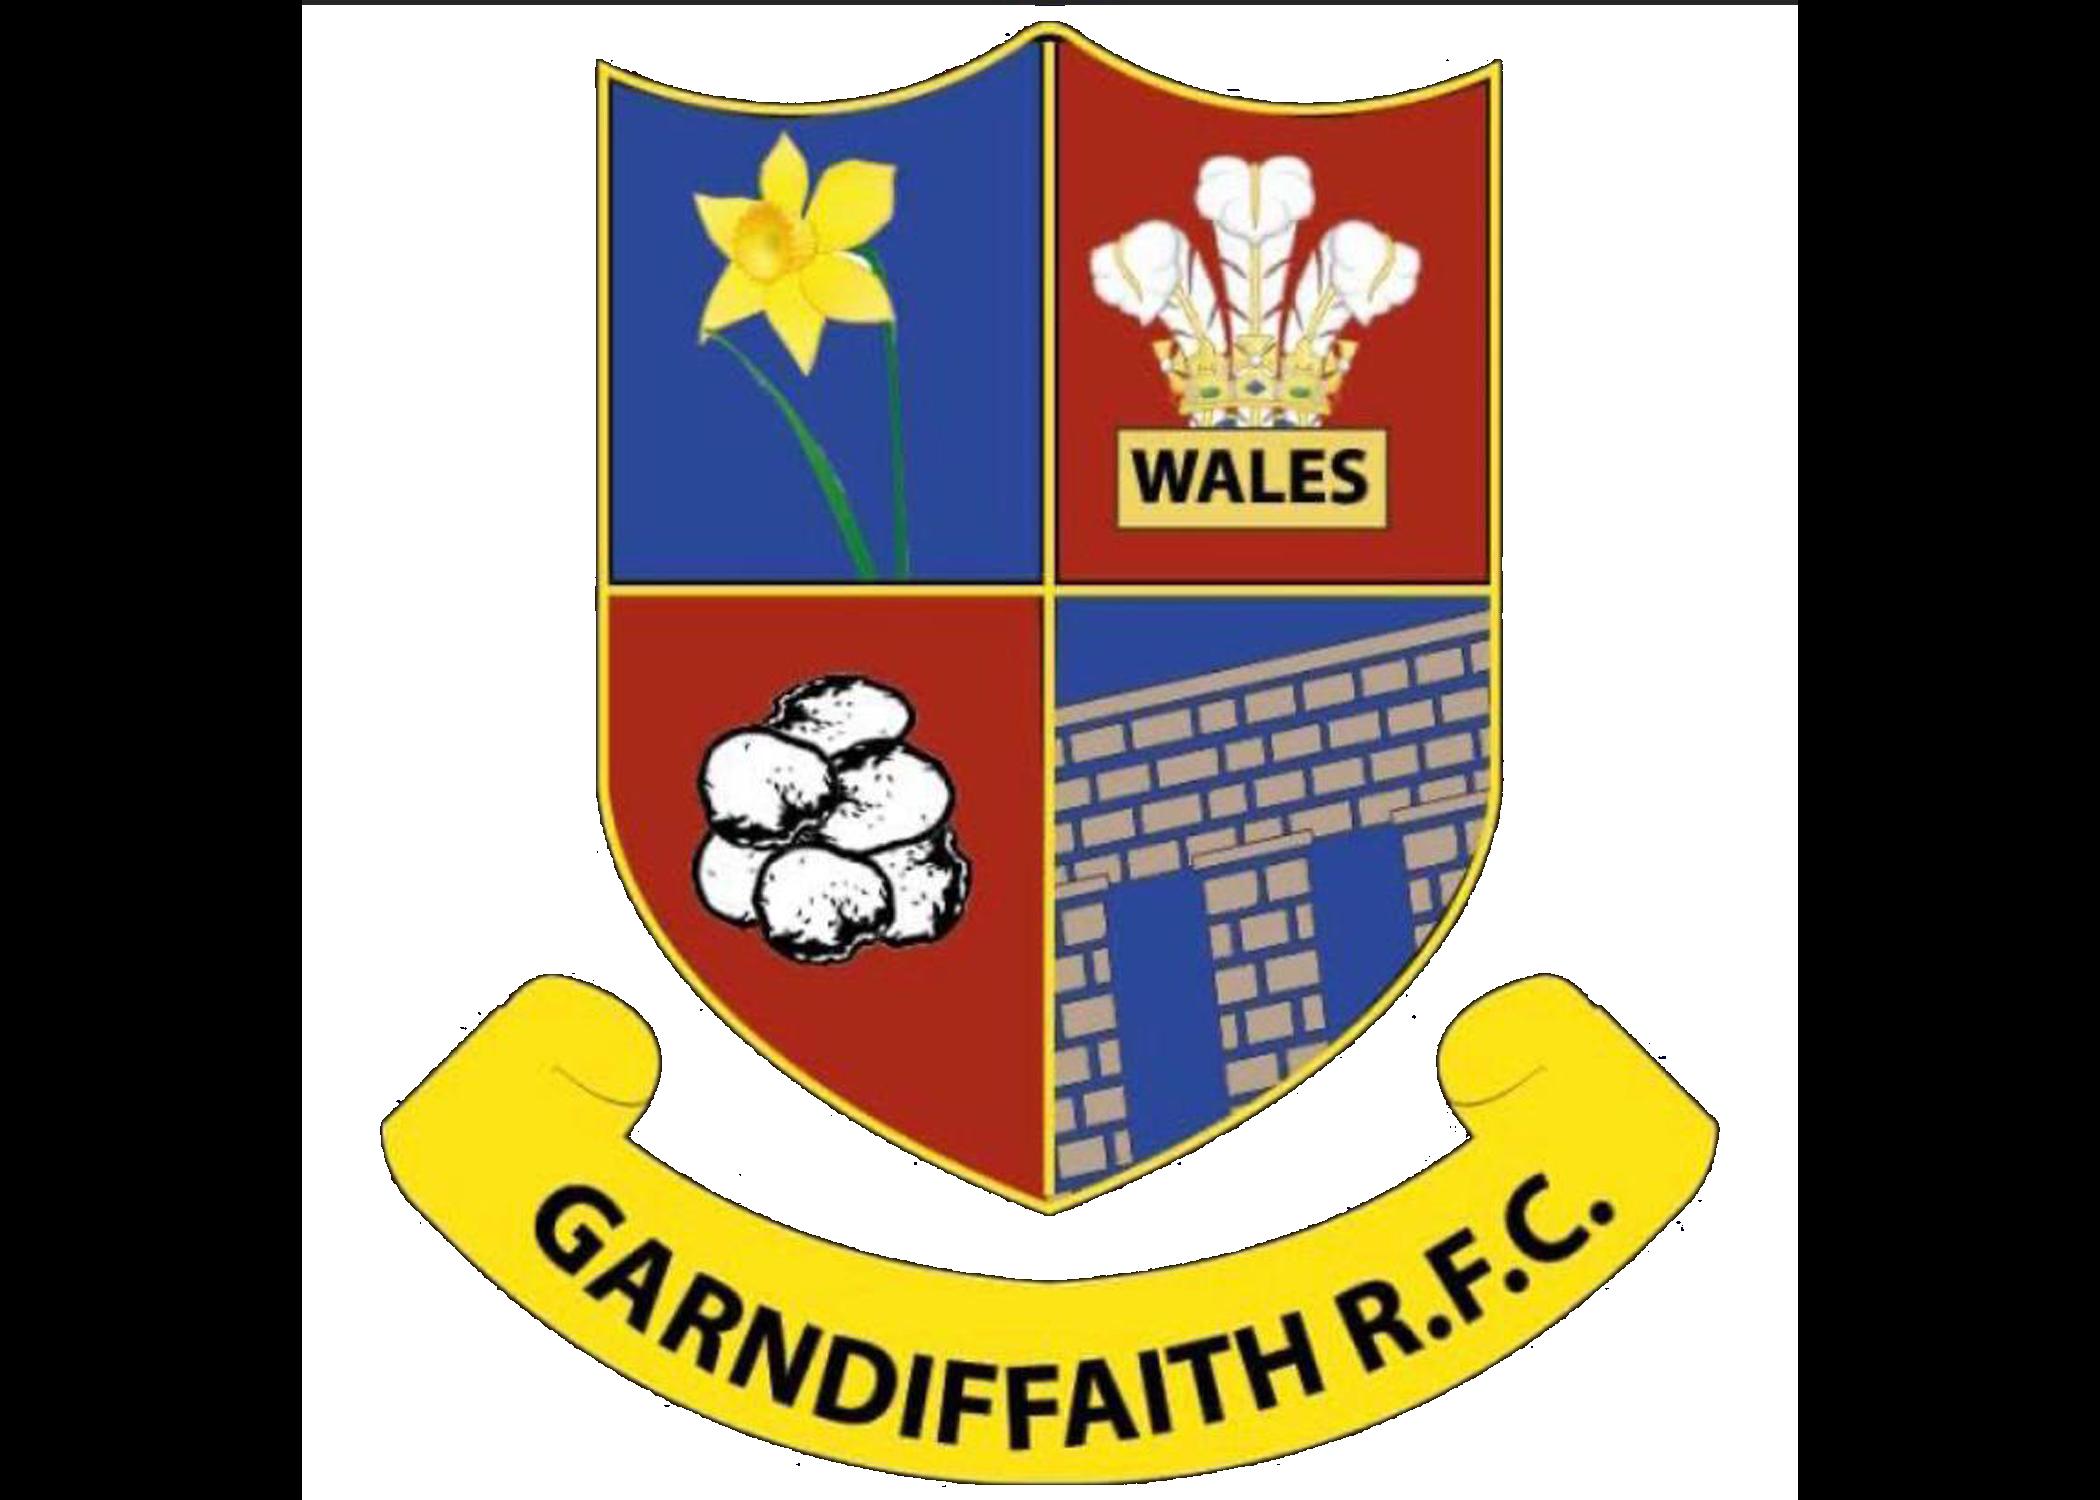 Garndiffaith RFC